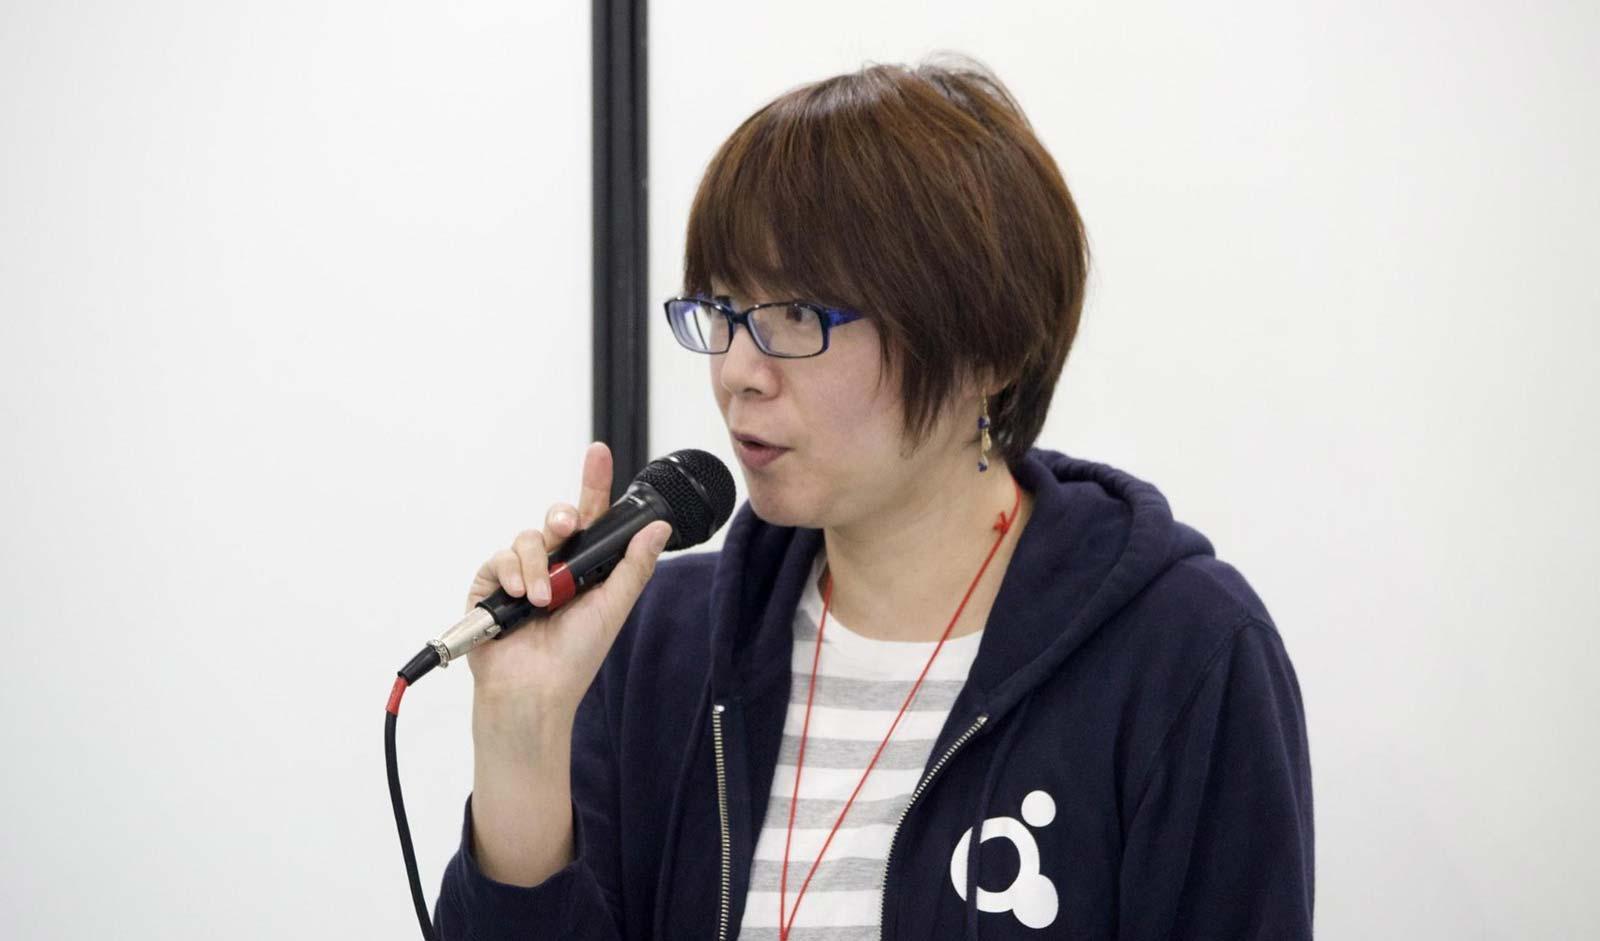 SATORI株式会社 マーケティング営業部 マーケティンググループ グループ長 相原 美智子氏